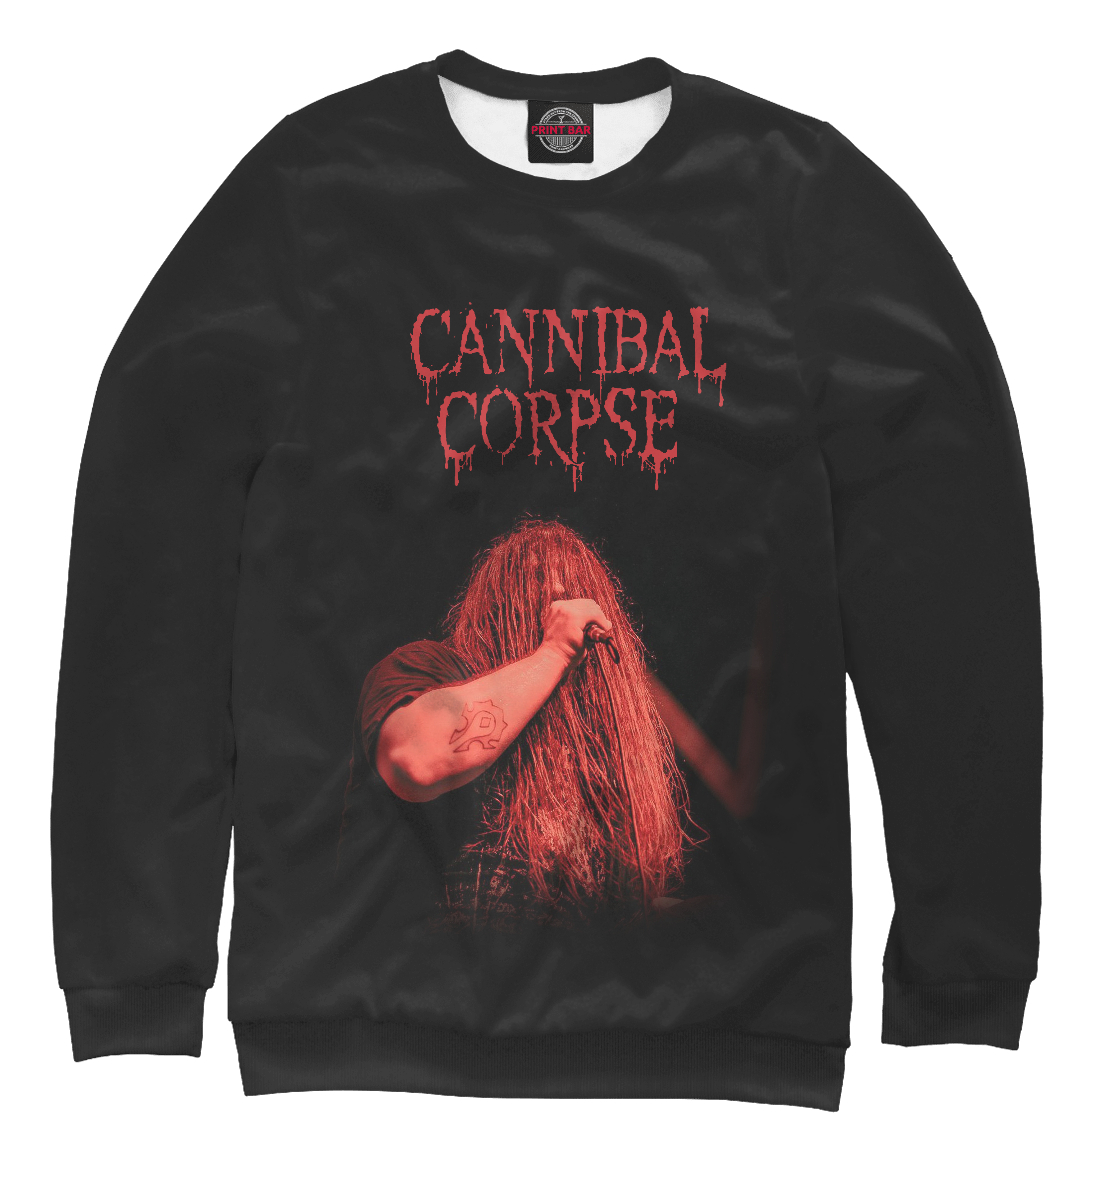 Купить George Fisher (Cannibal Corpse), Printbar, Свитшоты, MZK-217329-swi-1